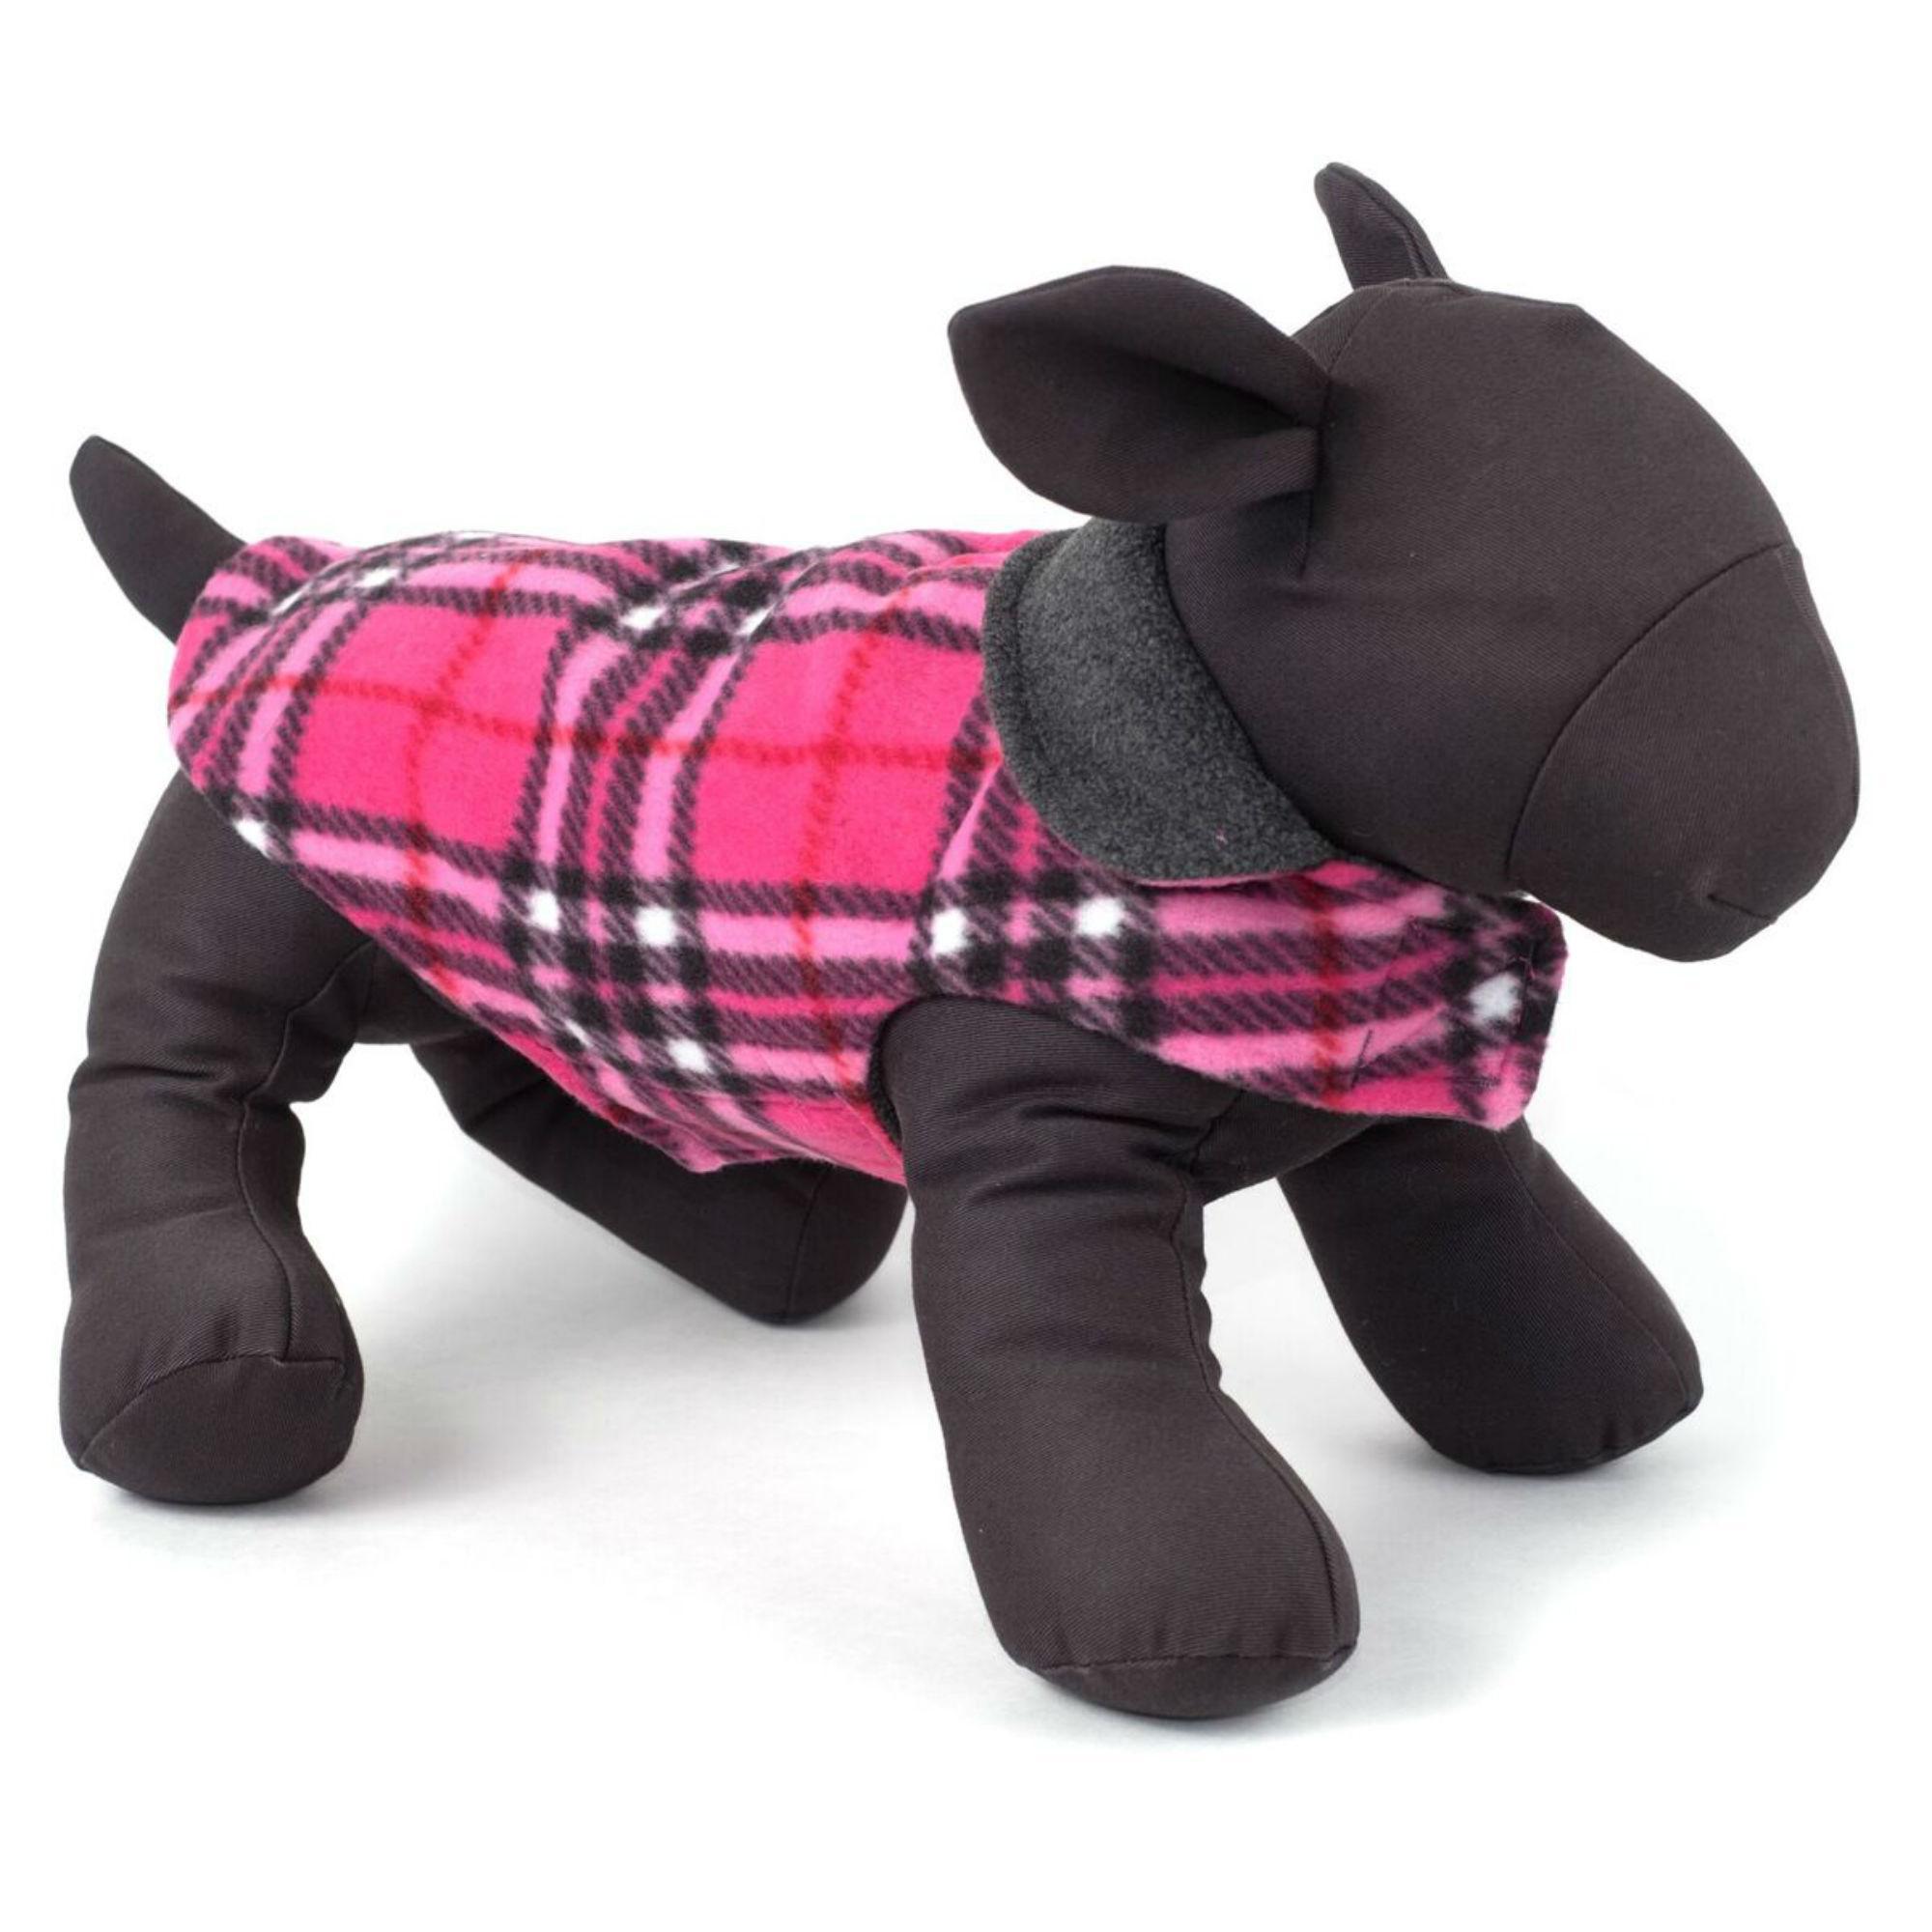 Worthy Dog Fargo Fleece Dog Jacket - Pink Plaid IV